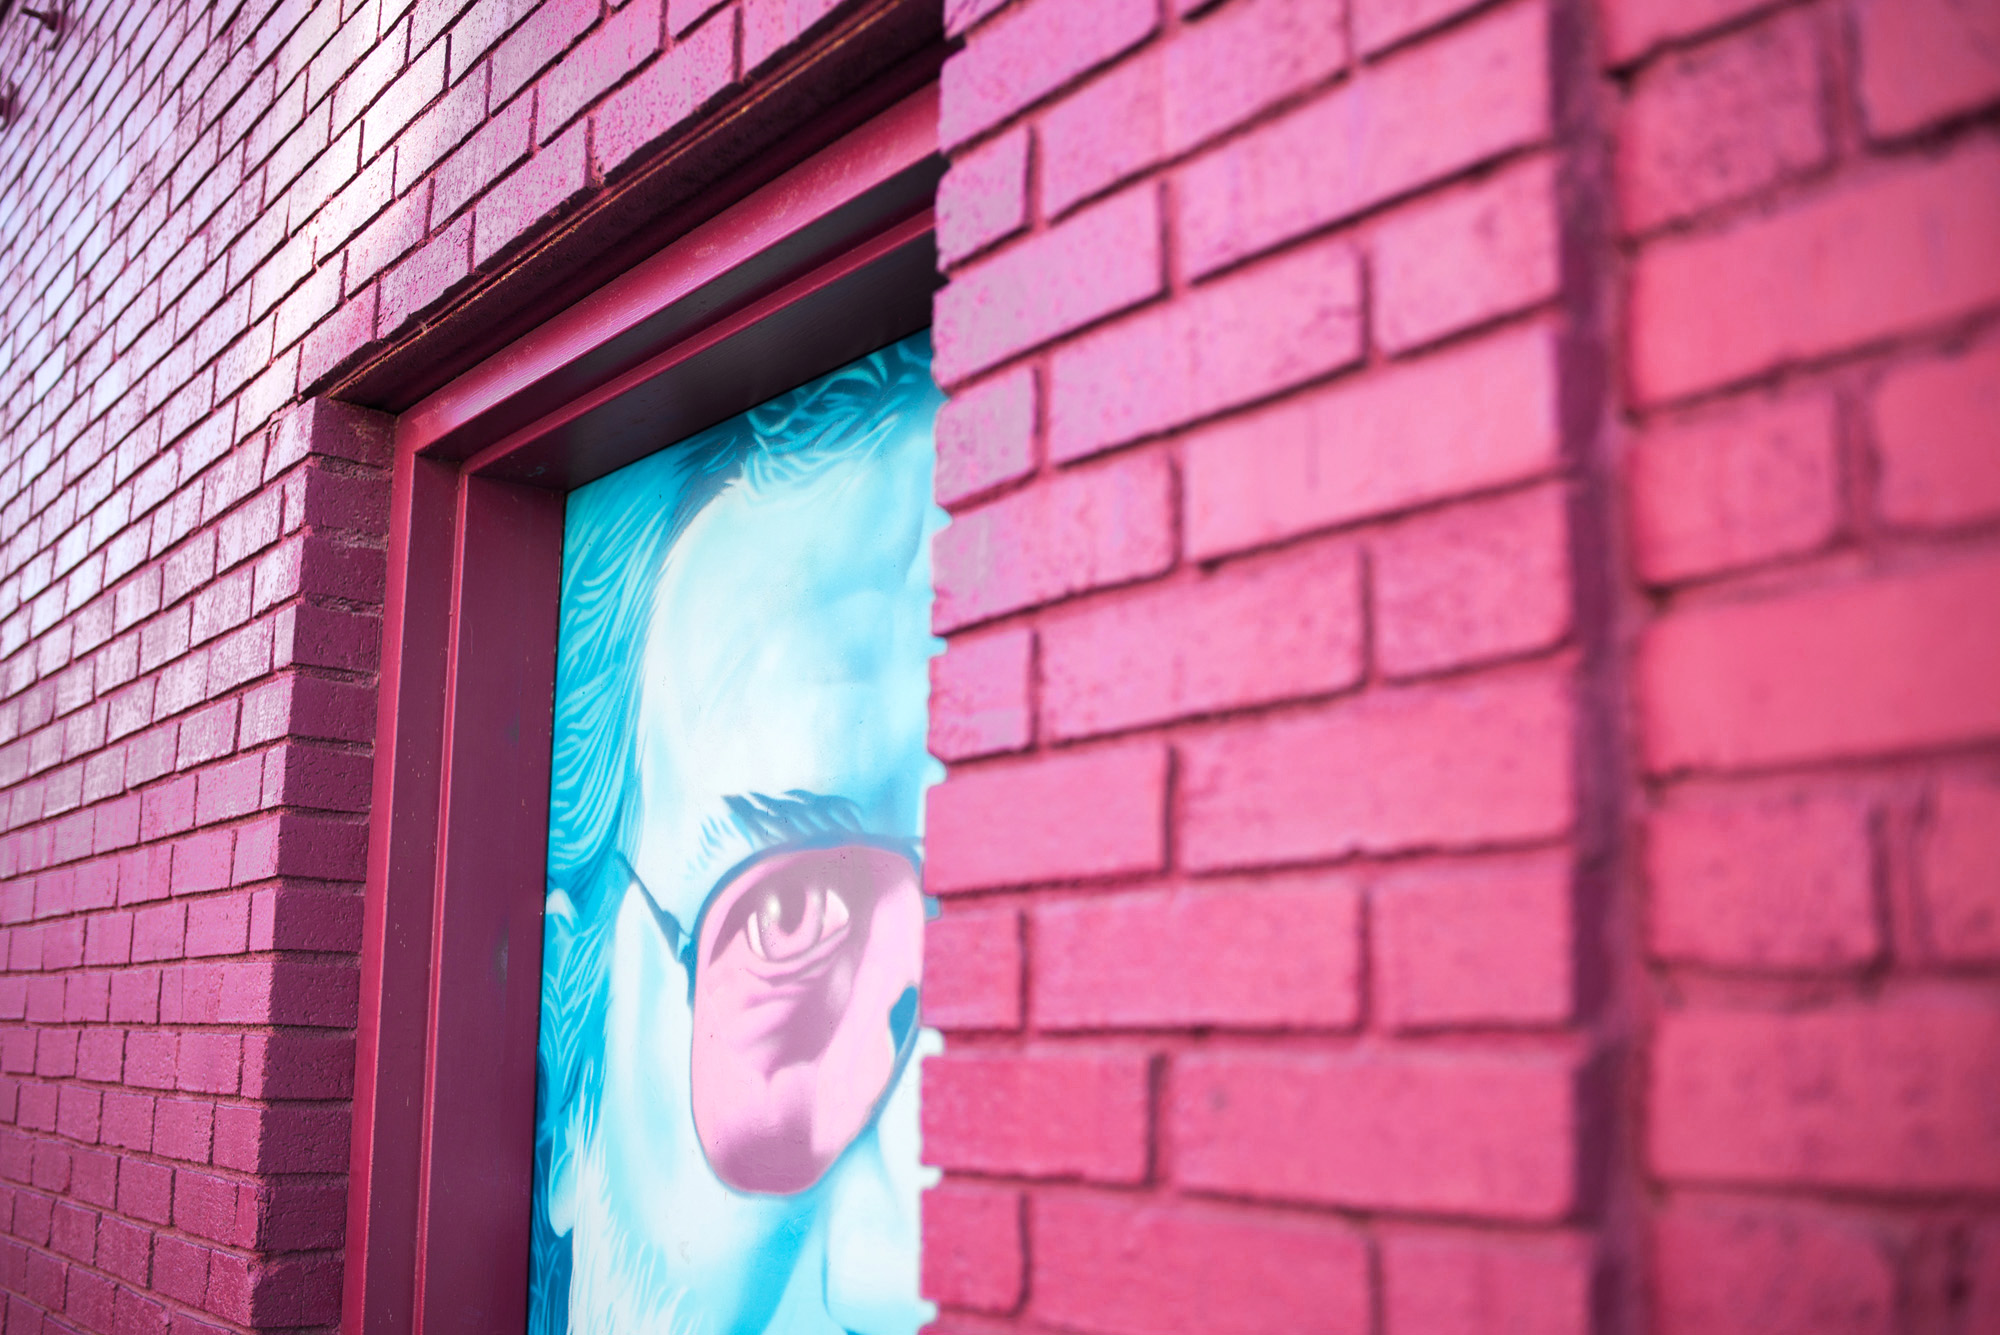 West Asheville Graffiti